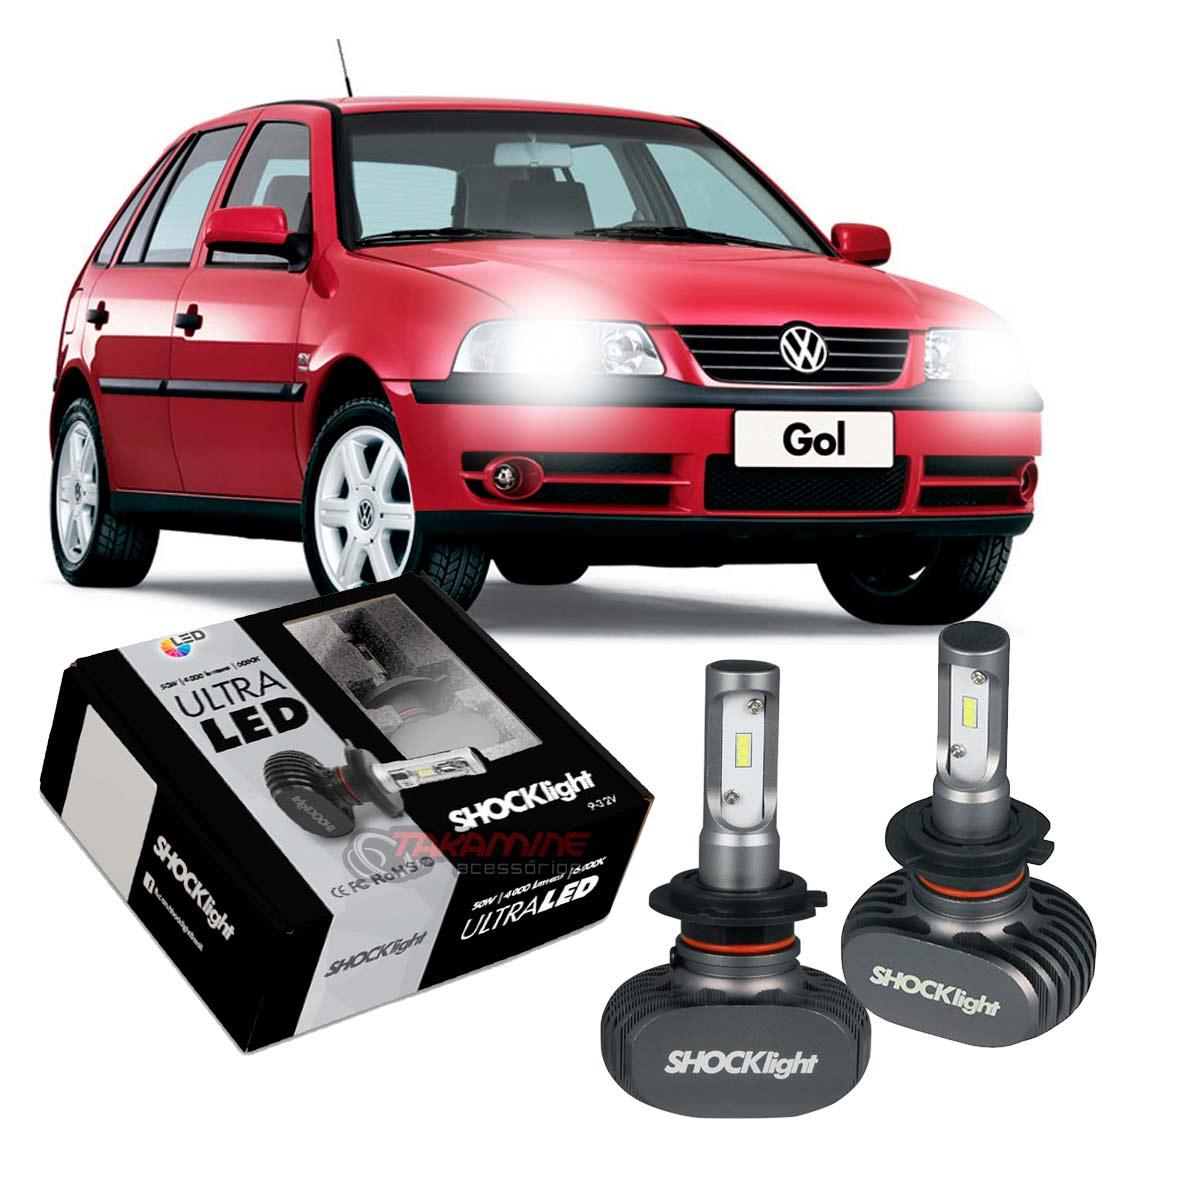 Kit Ultra LED Gol G3 farol duplo 2000 2001 2002 2003 2004 2005 tipo xenon farol baixo H7 50W